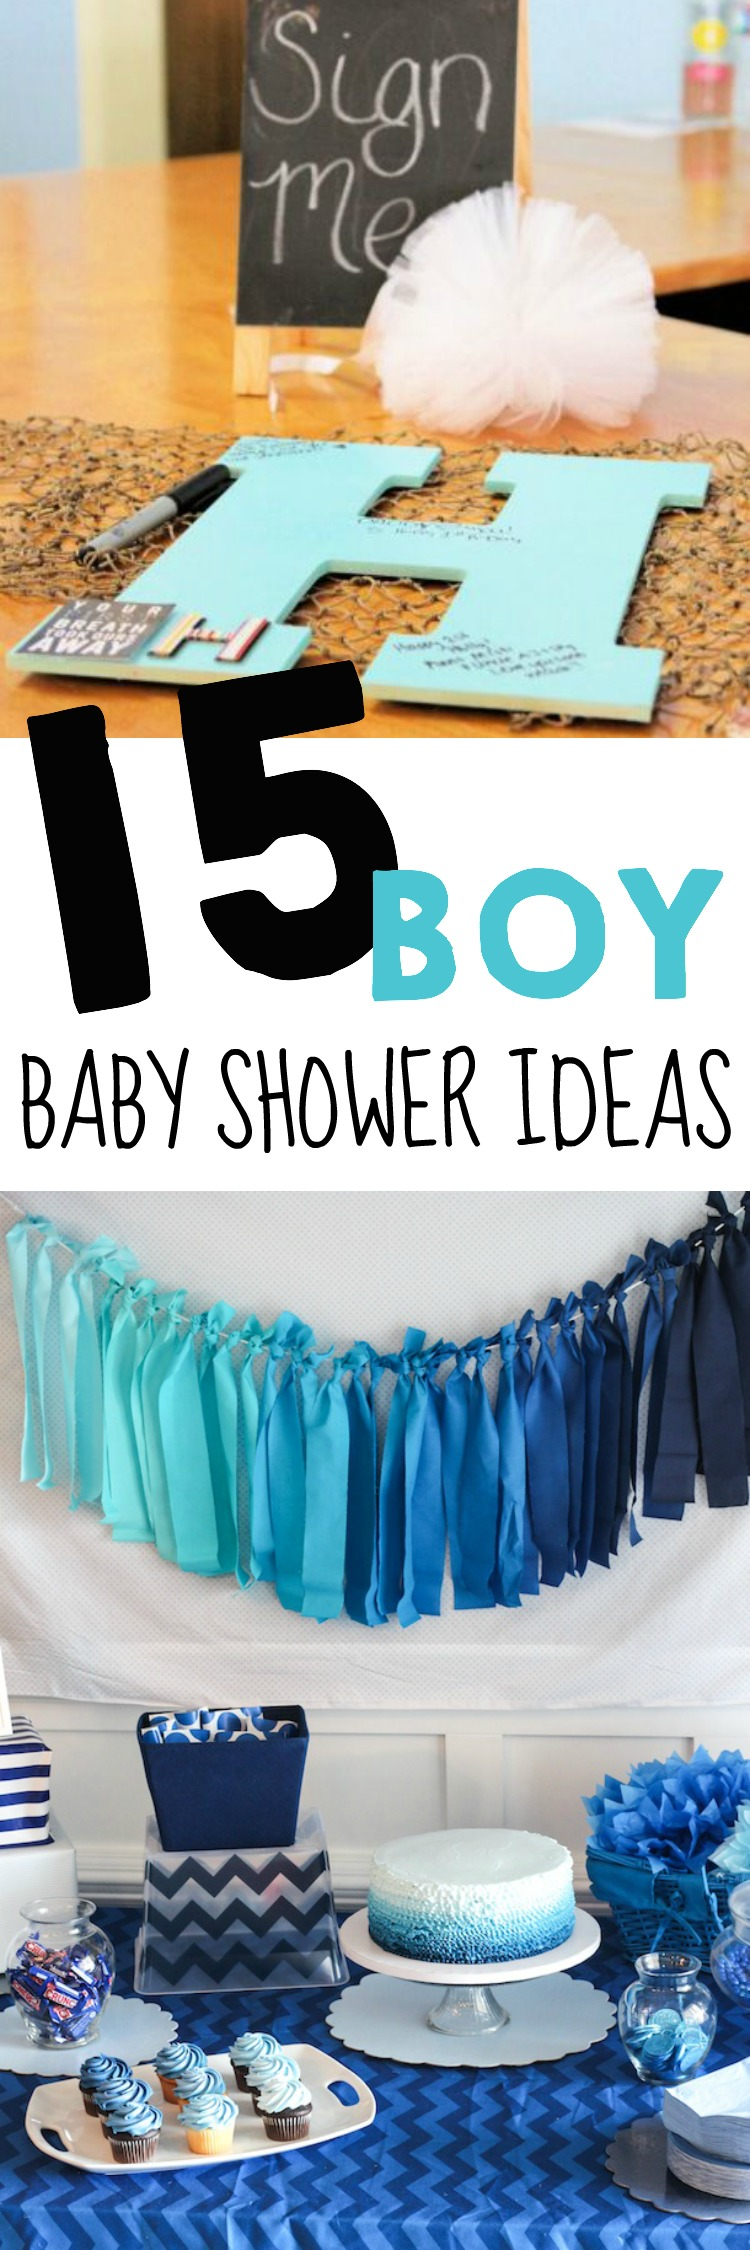 baby shower ideas for boys : 15 boy baby shower ideas